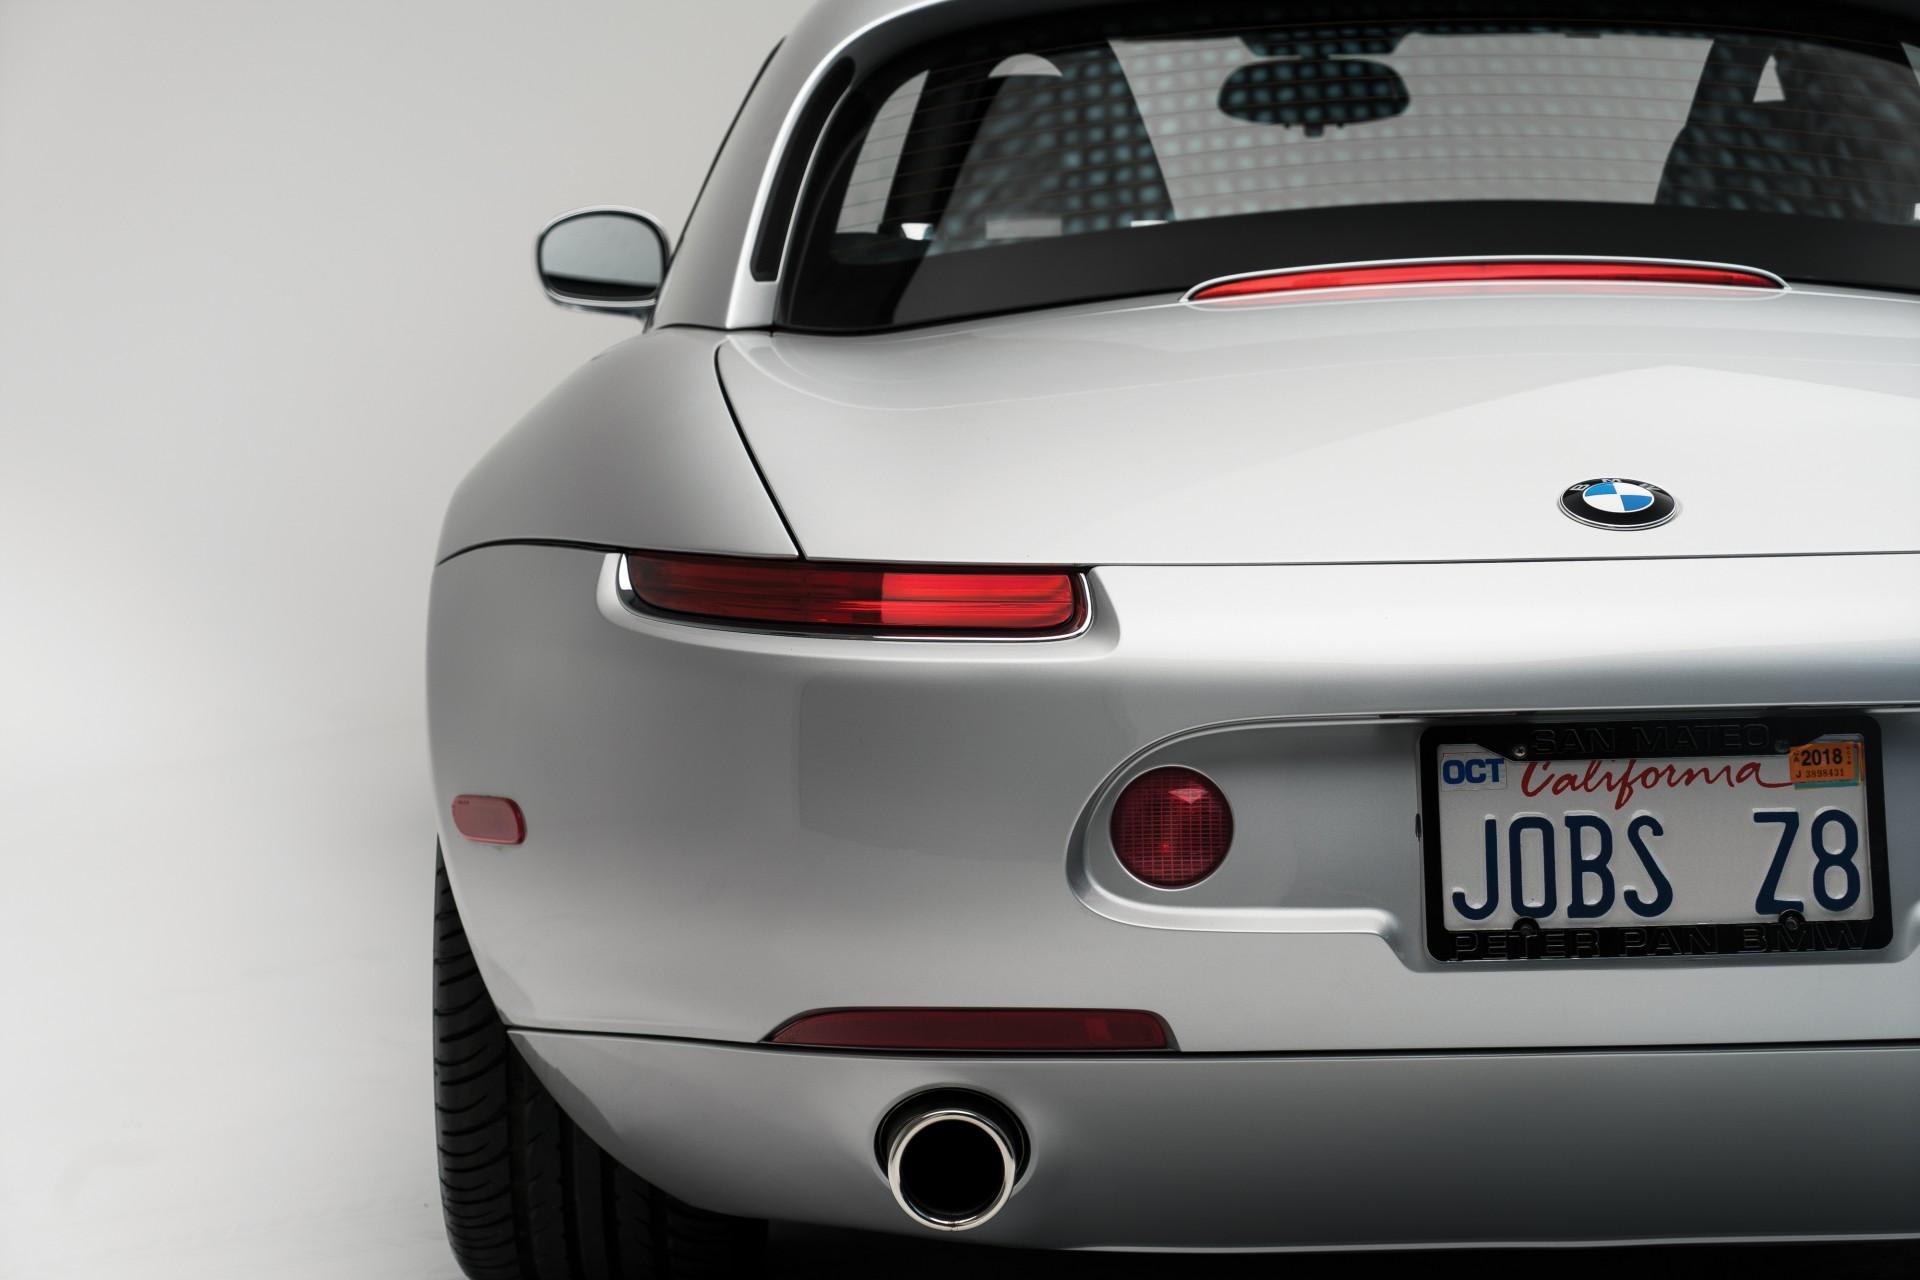 la-bmw-z8-di-steve-jobs-824577de995ffdb15eb48f57174565f2 Marvelous Porsche 918 Spyder Hybrid Prezzo Cars Trend